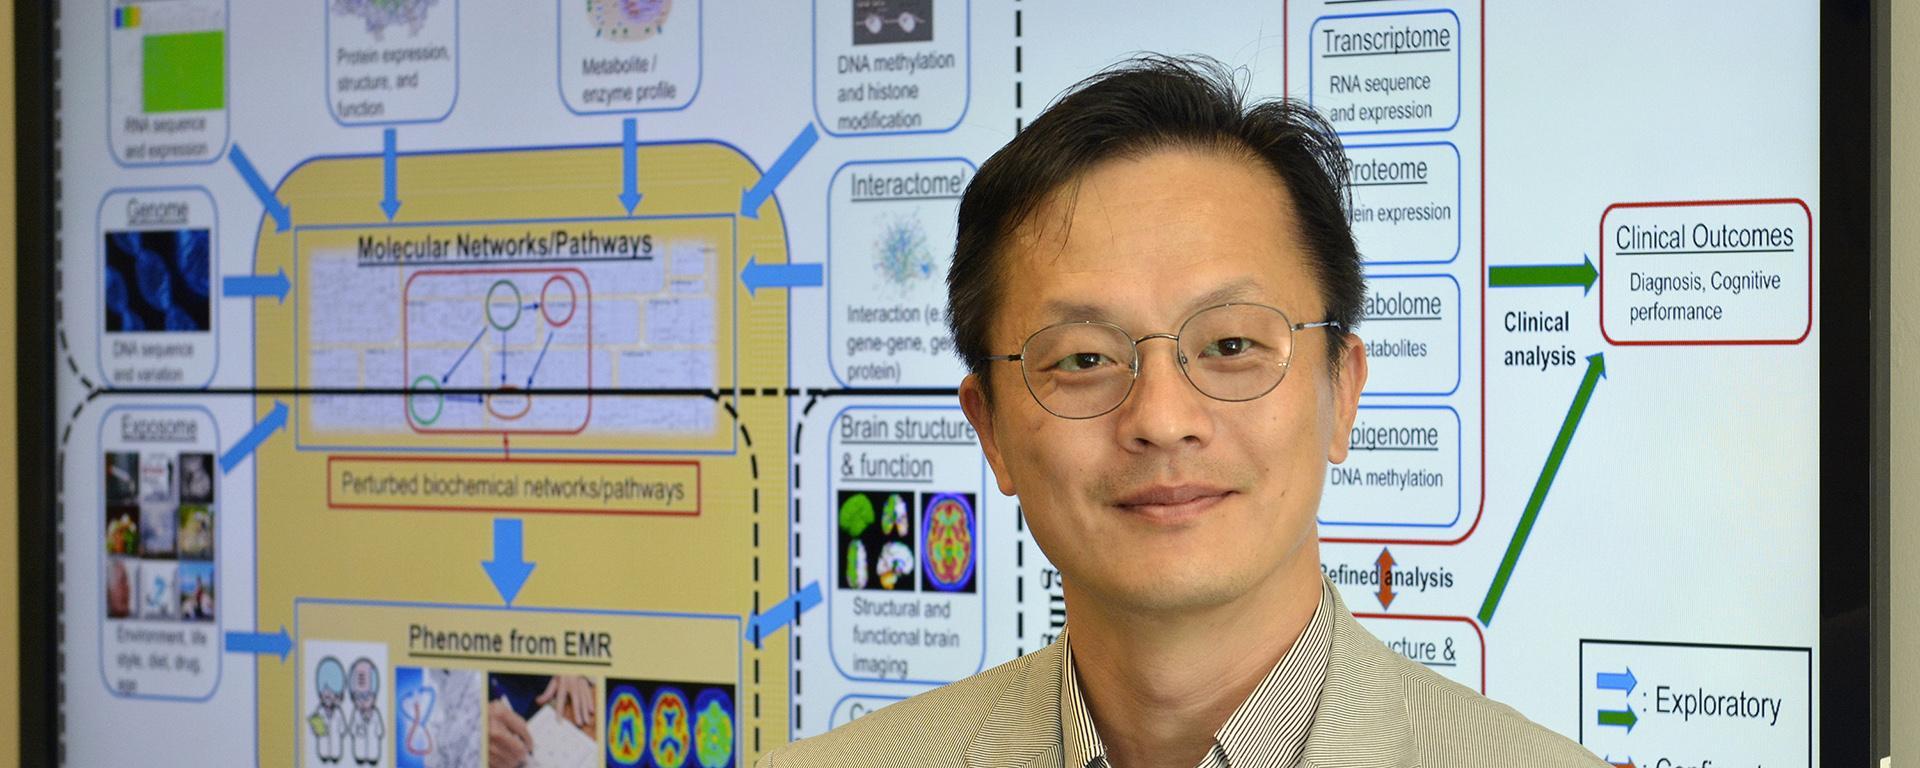 Sungeun Kim stands in front of a data flowchart